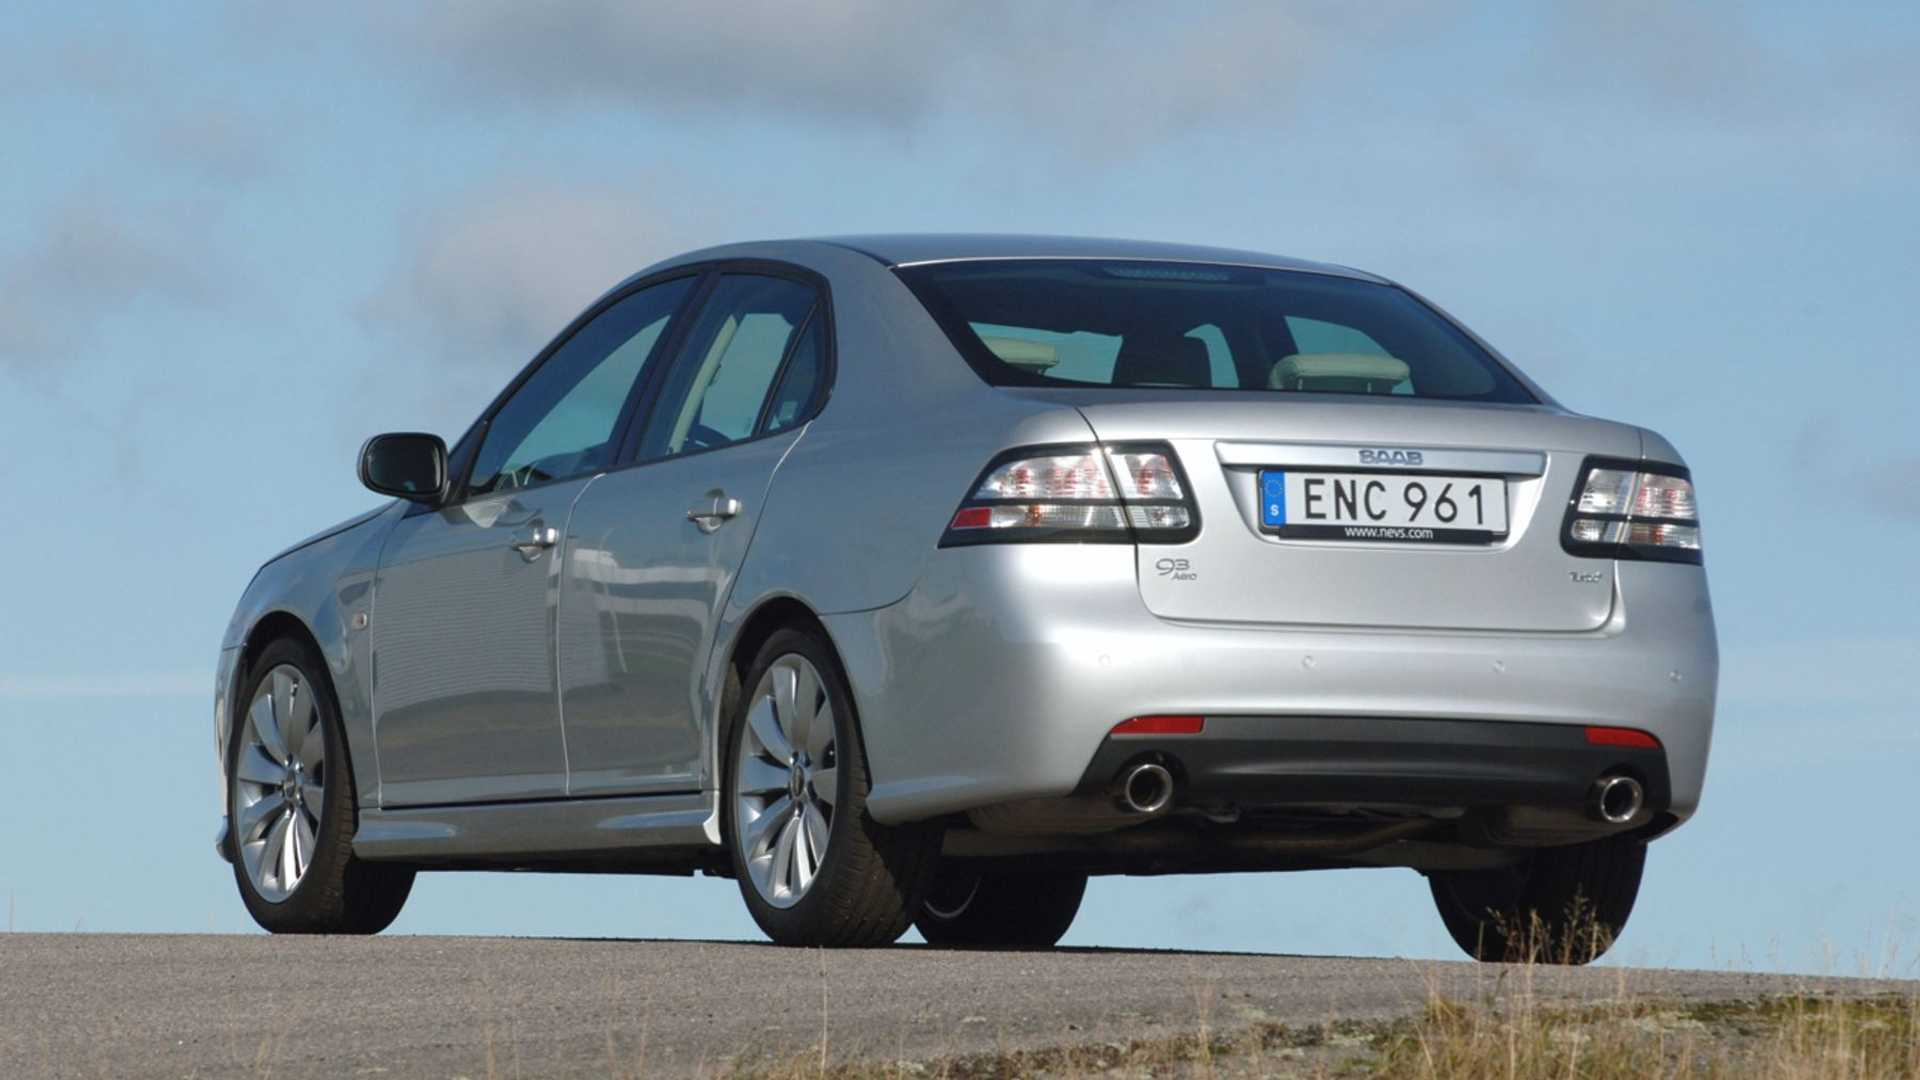 Последний Saab в истории продали на аукционе 2